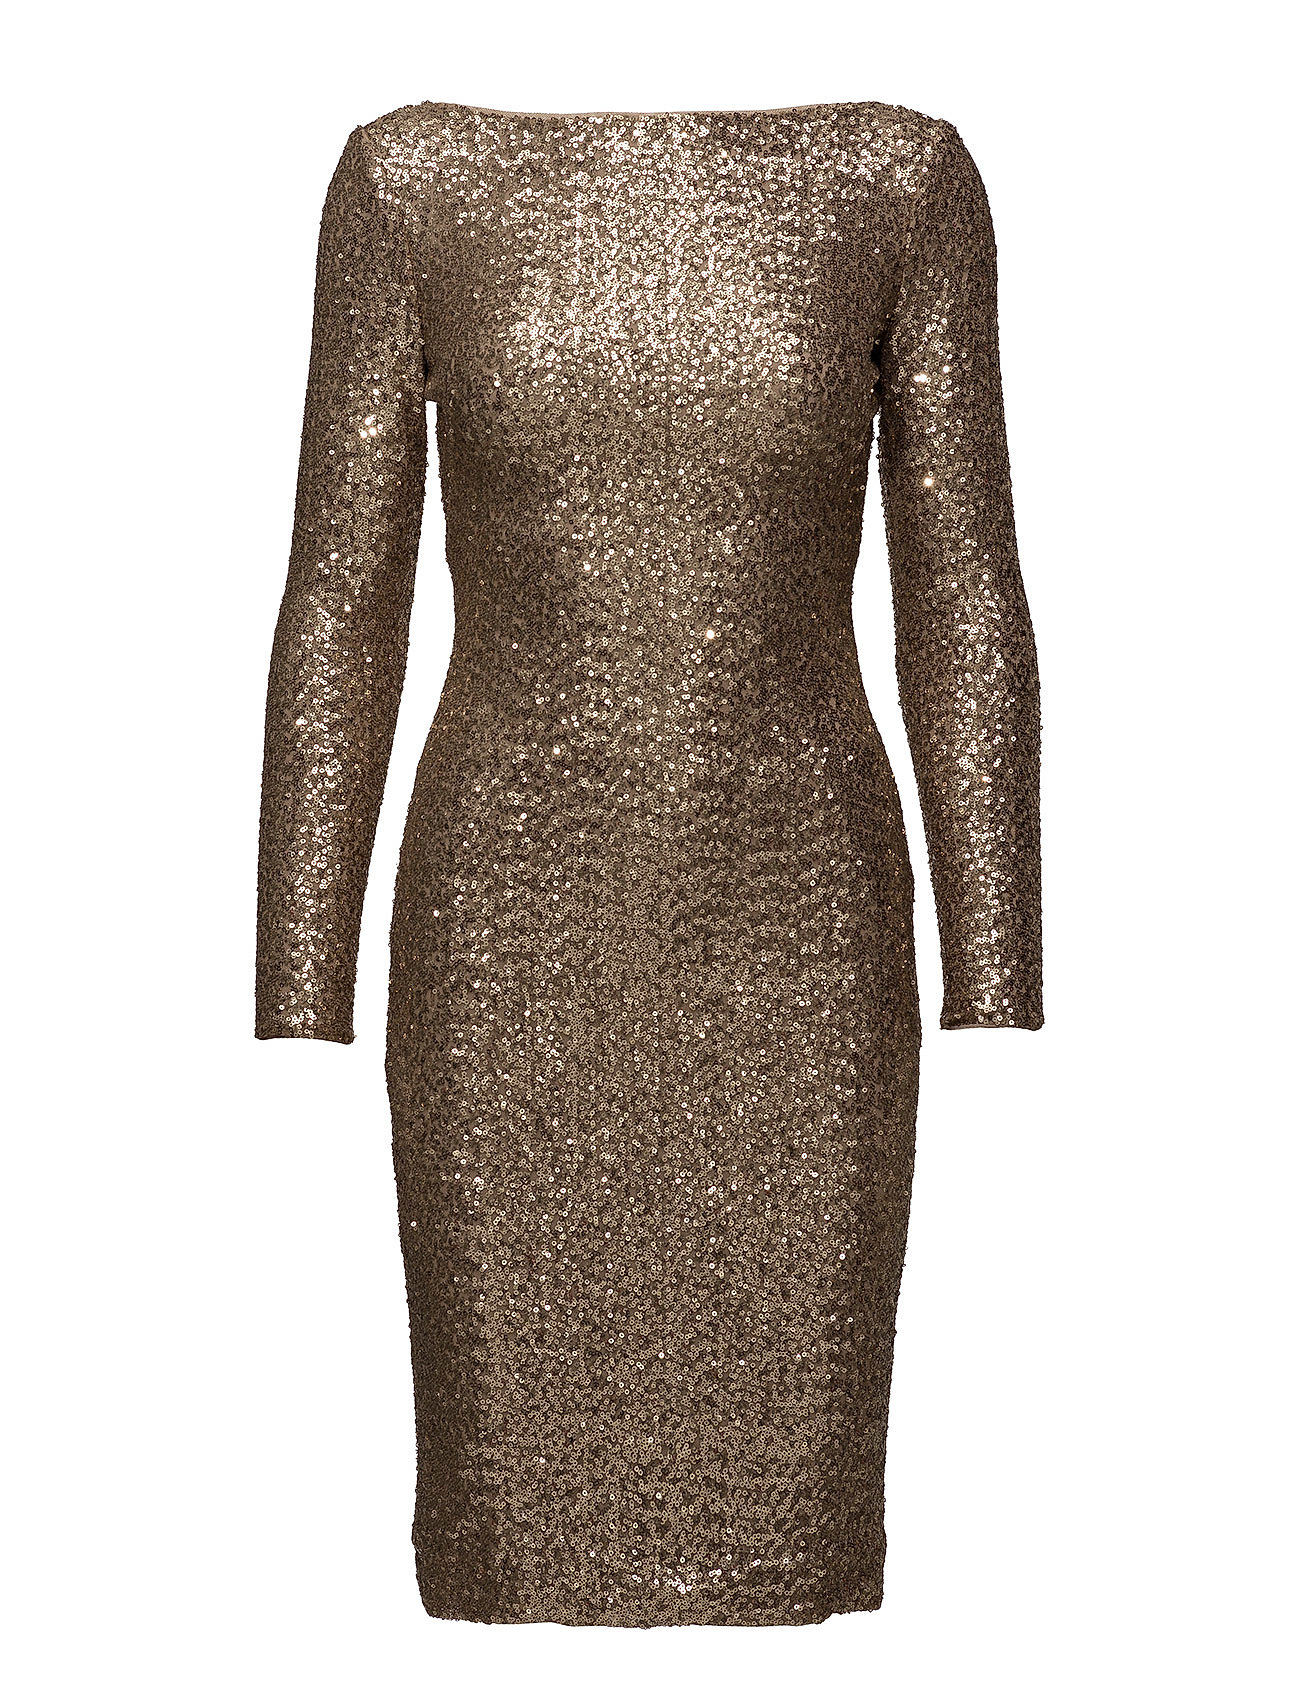 Sequined Scoopback Dress (White Sand Shine) (£135) - Lauren Ralph ...